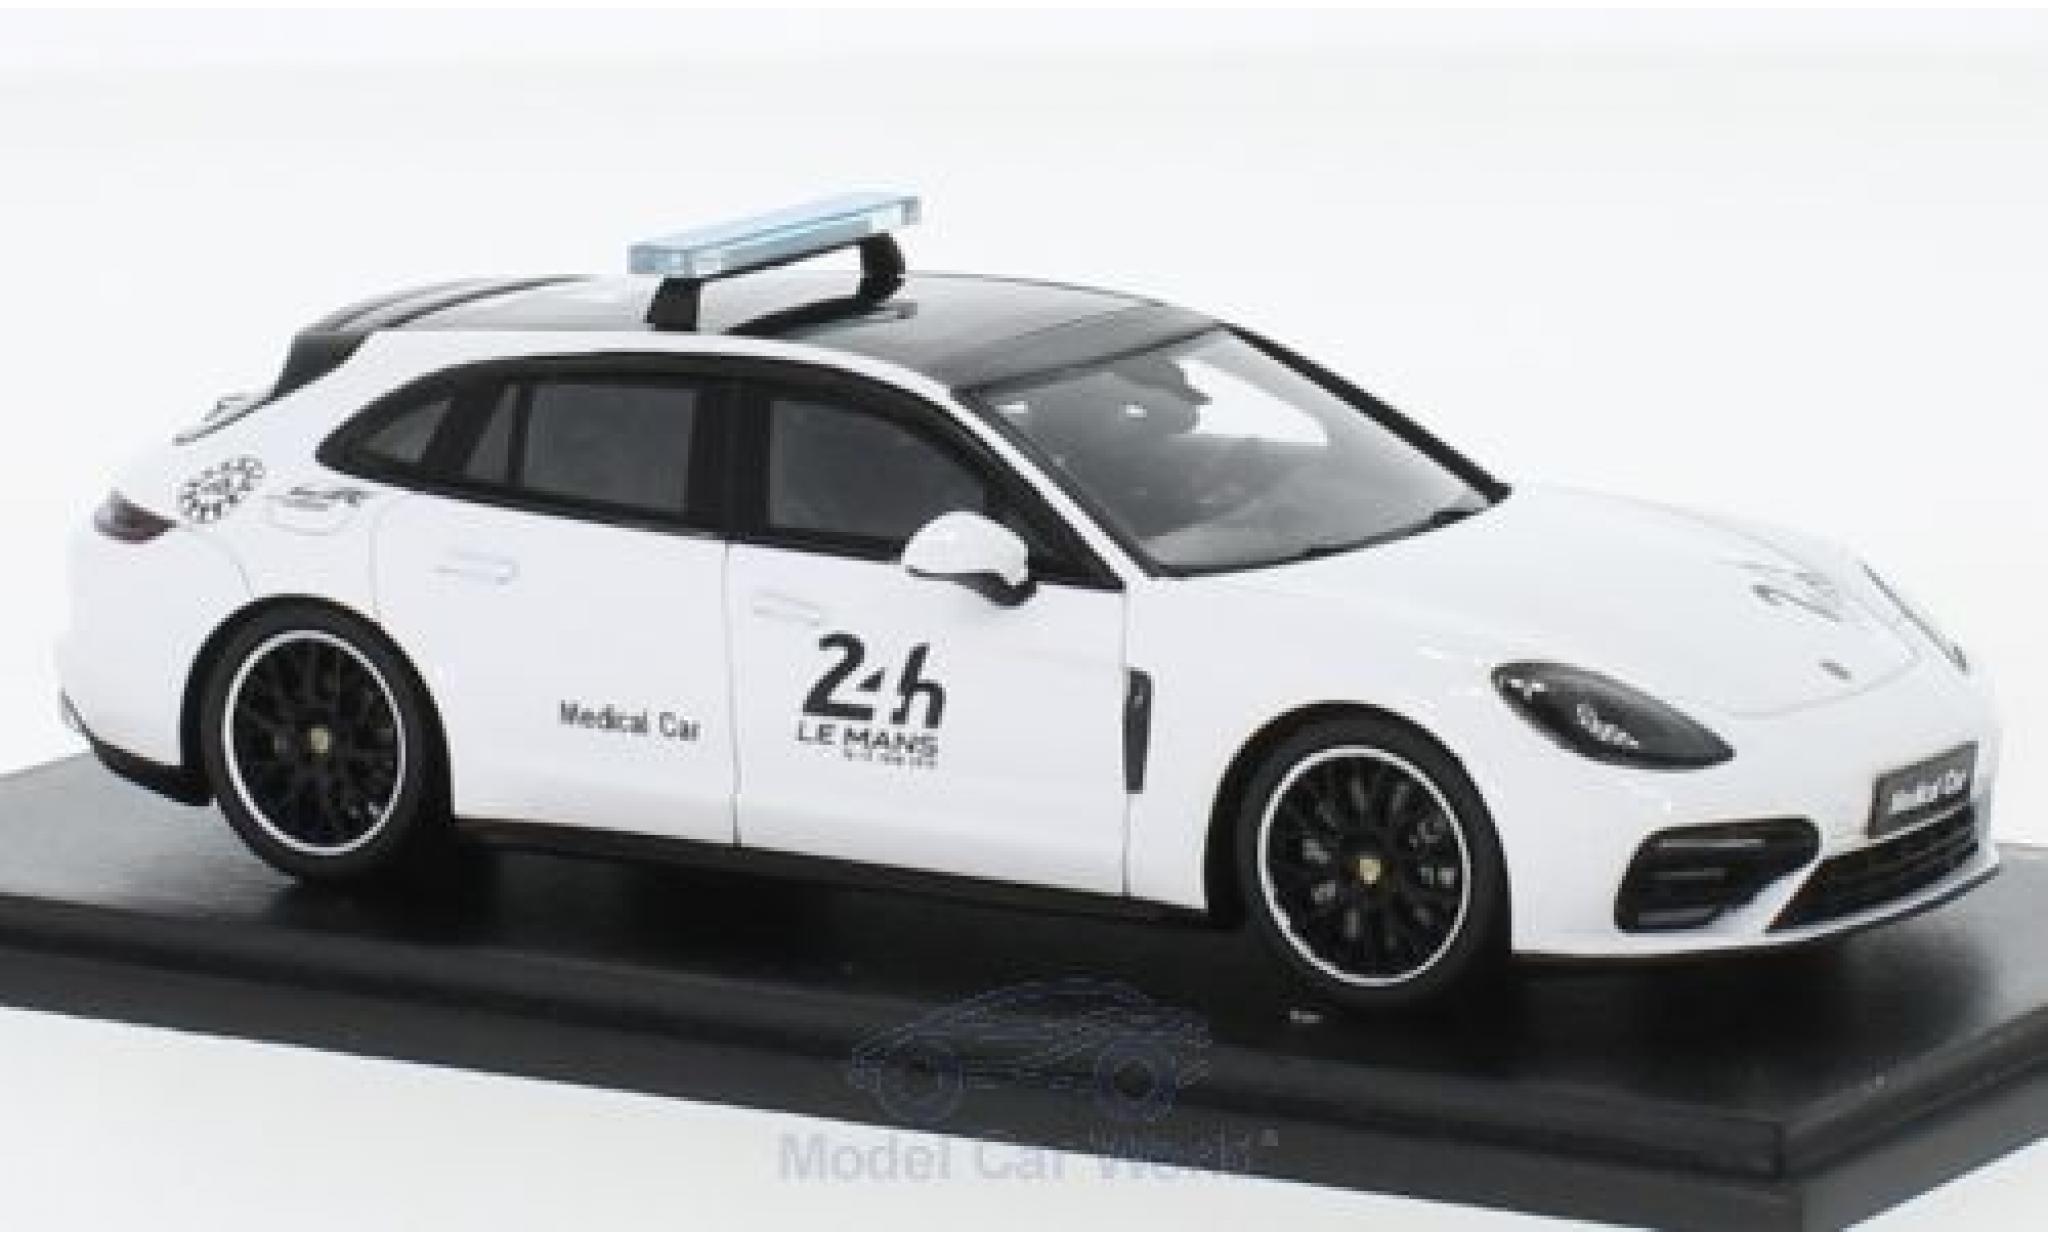 Porsche Panamera 1/43 Spark Sport Turismo 24h Le Mans 2018 Medical Car